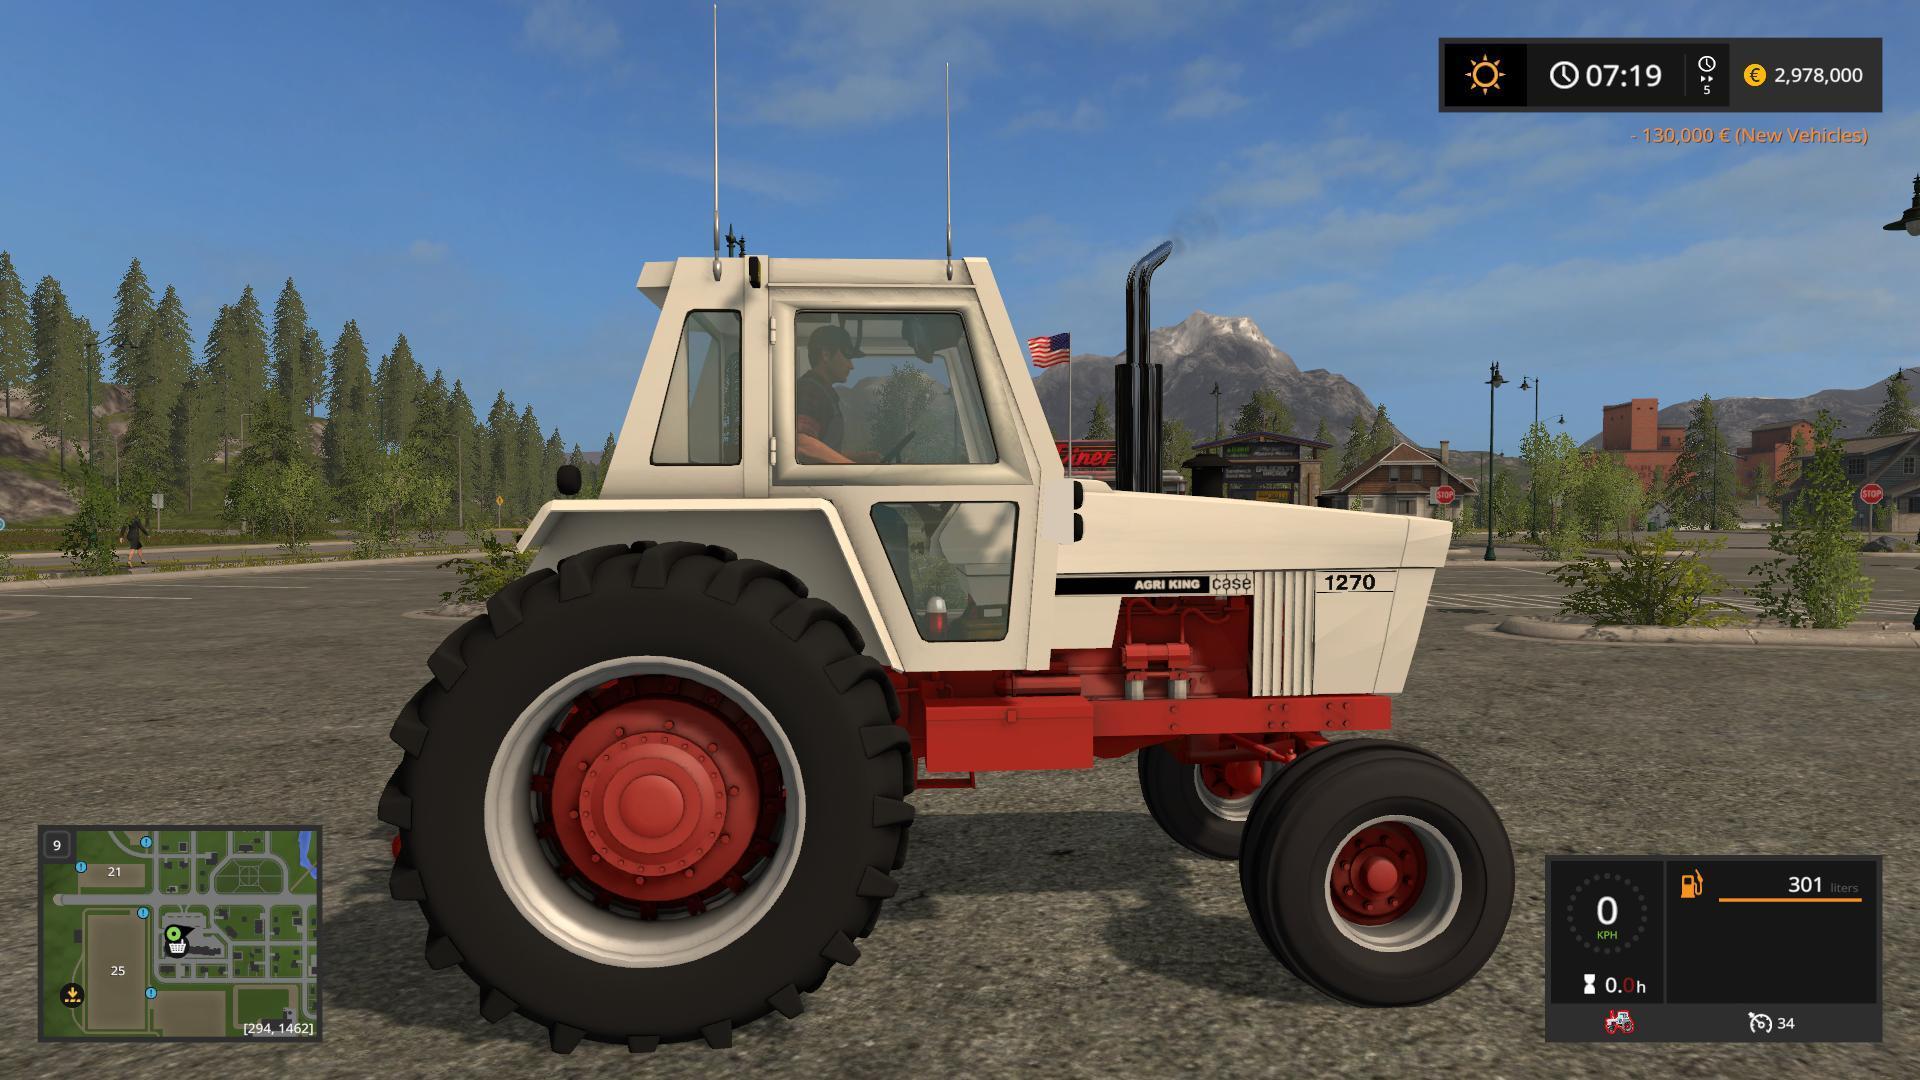 OLD IRON CASE 70 SERIES TRACTOR V1 0 MOD - Farming simulator